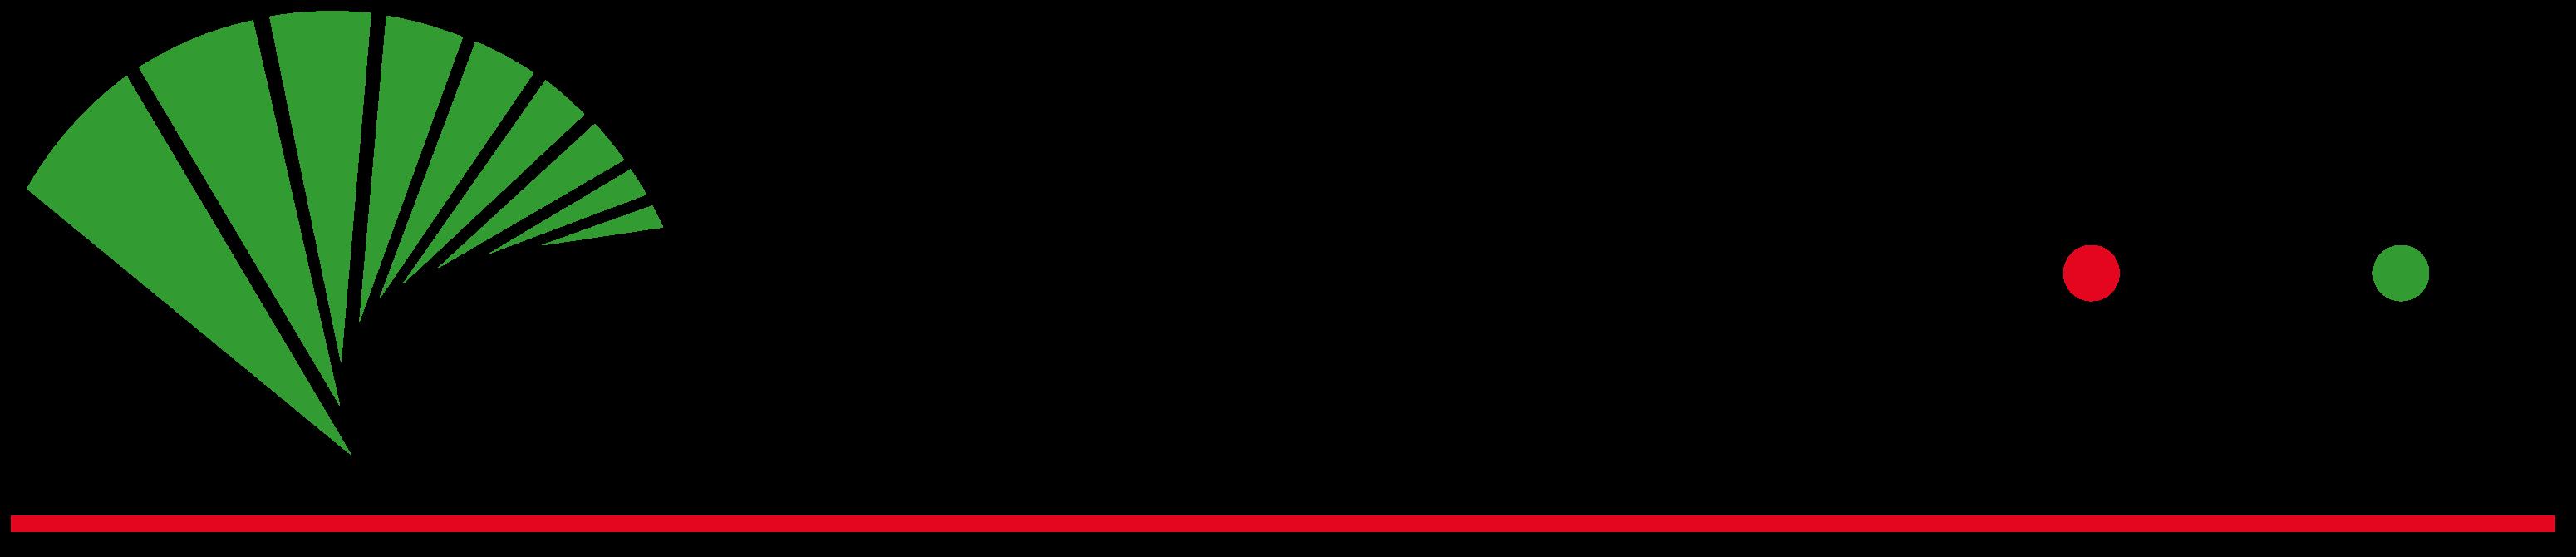 Fundación Unicaja miembro del grupo CECA